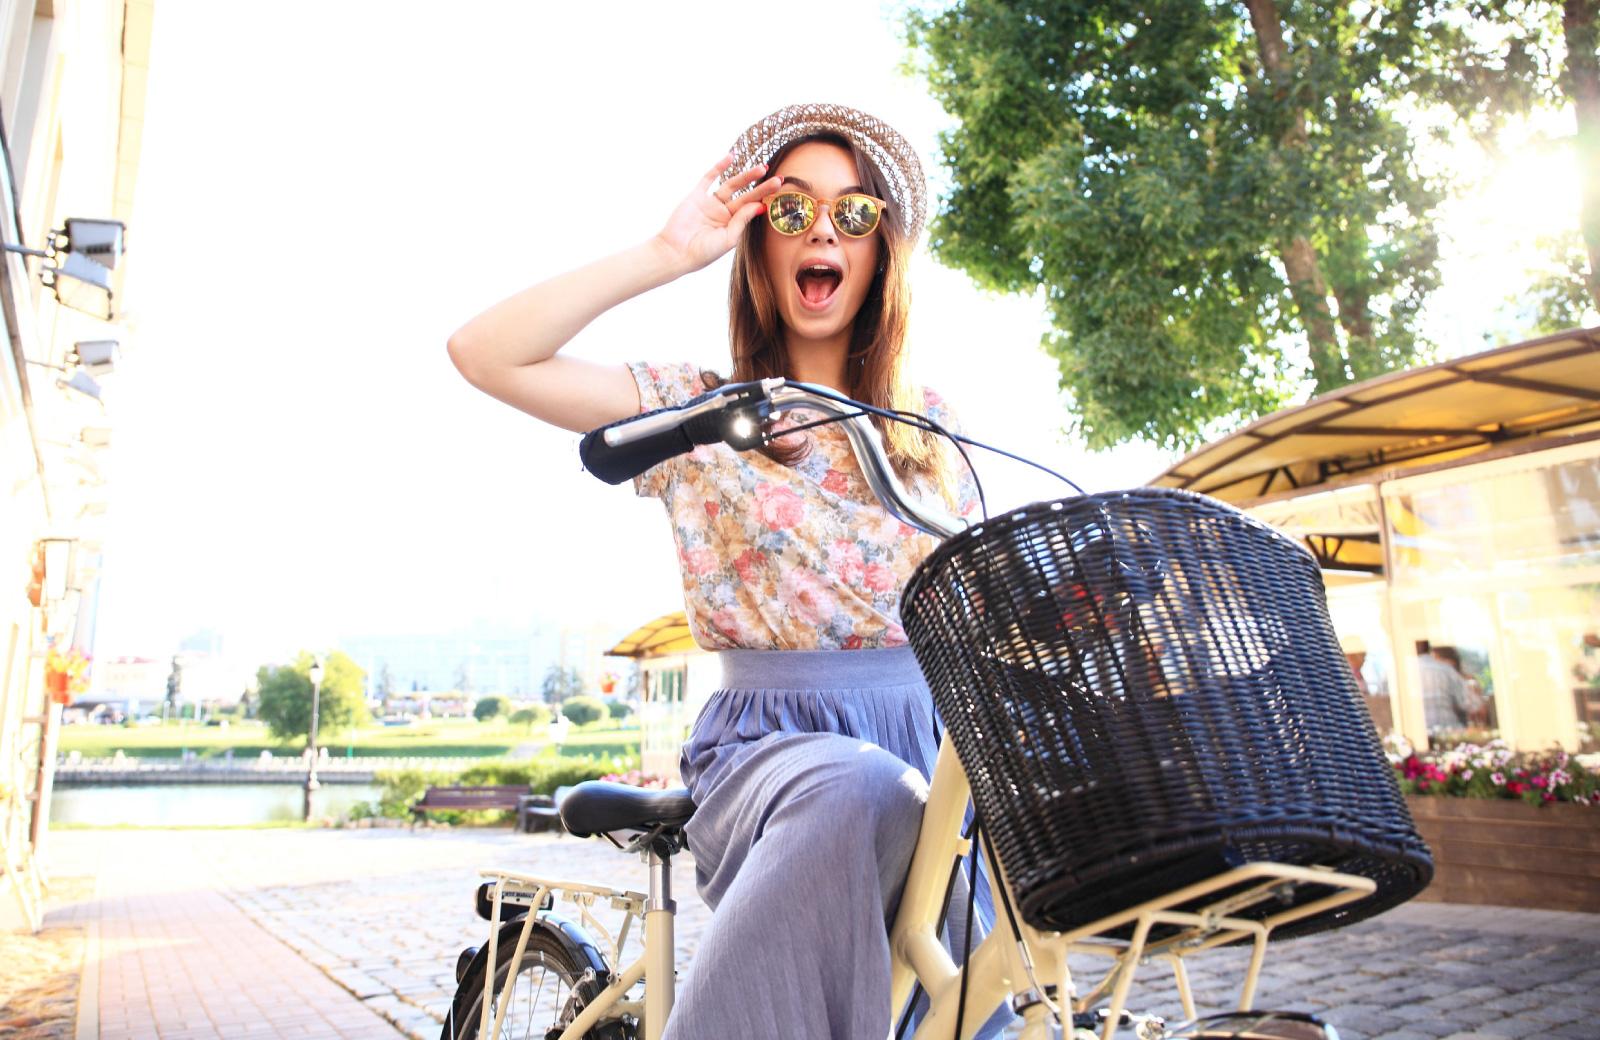 girl on a bike with basket